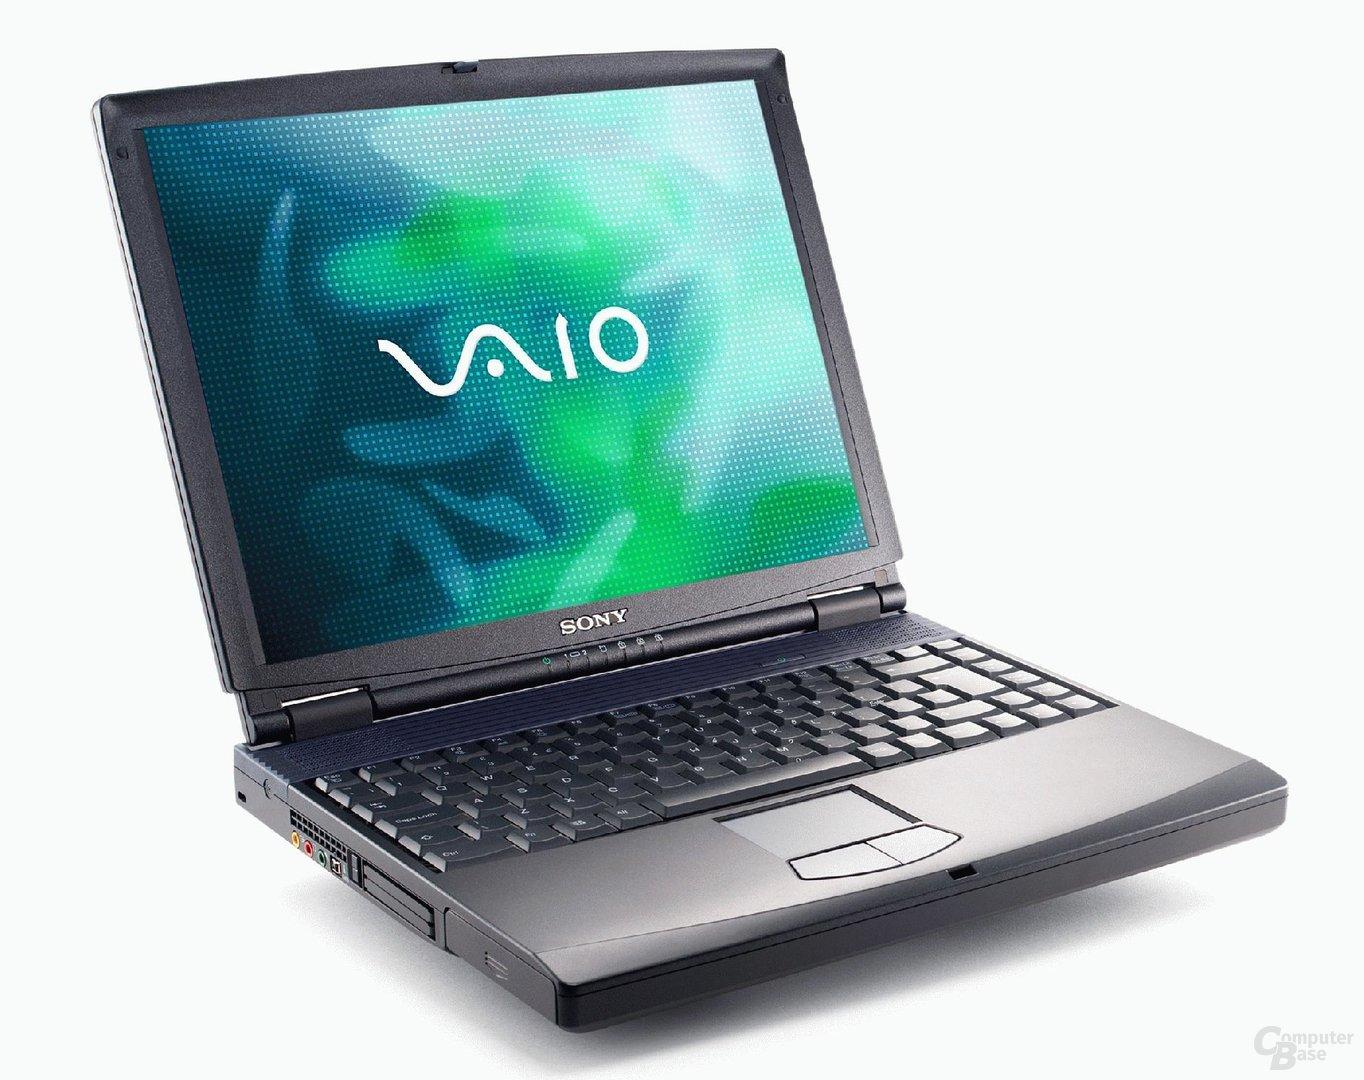 Sony VAIO FX605 mit Mobile Athlon XP